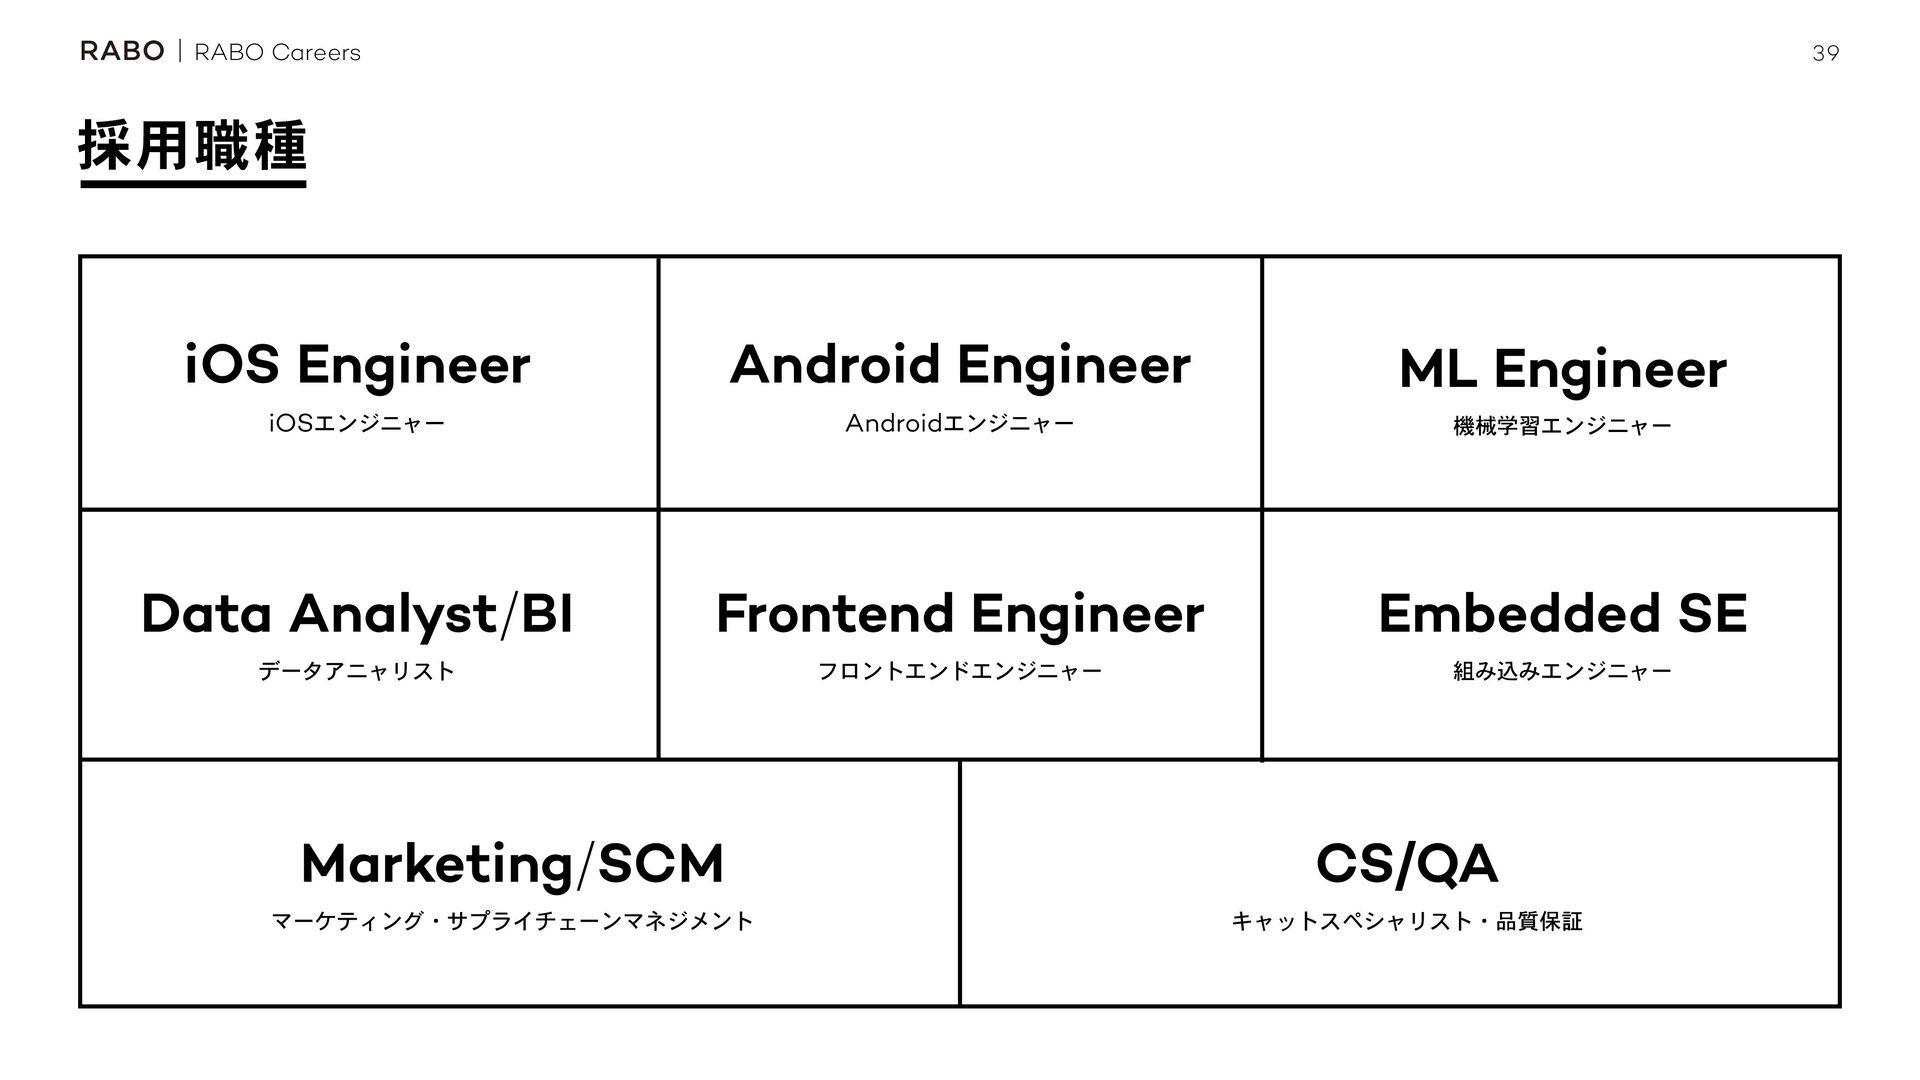 39 RABO Careers ࠾༻ใ RABO Careers